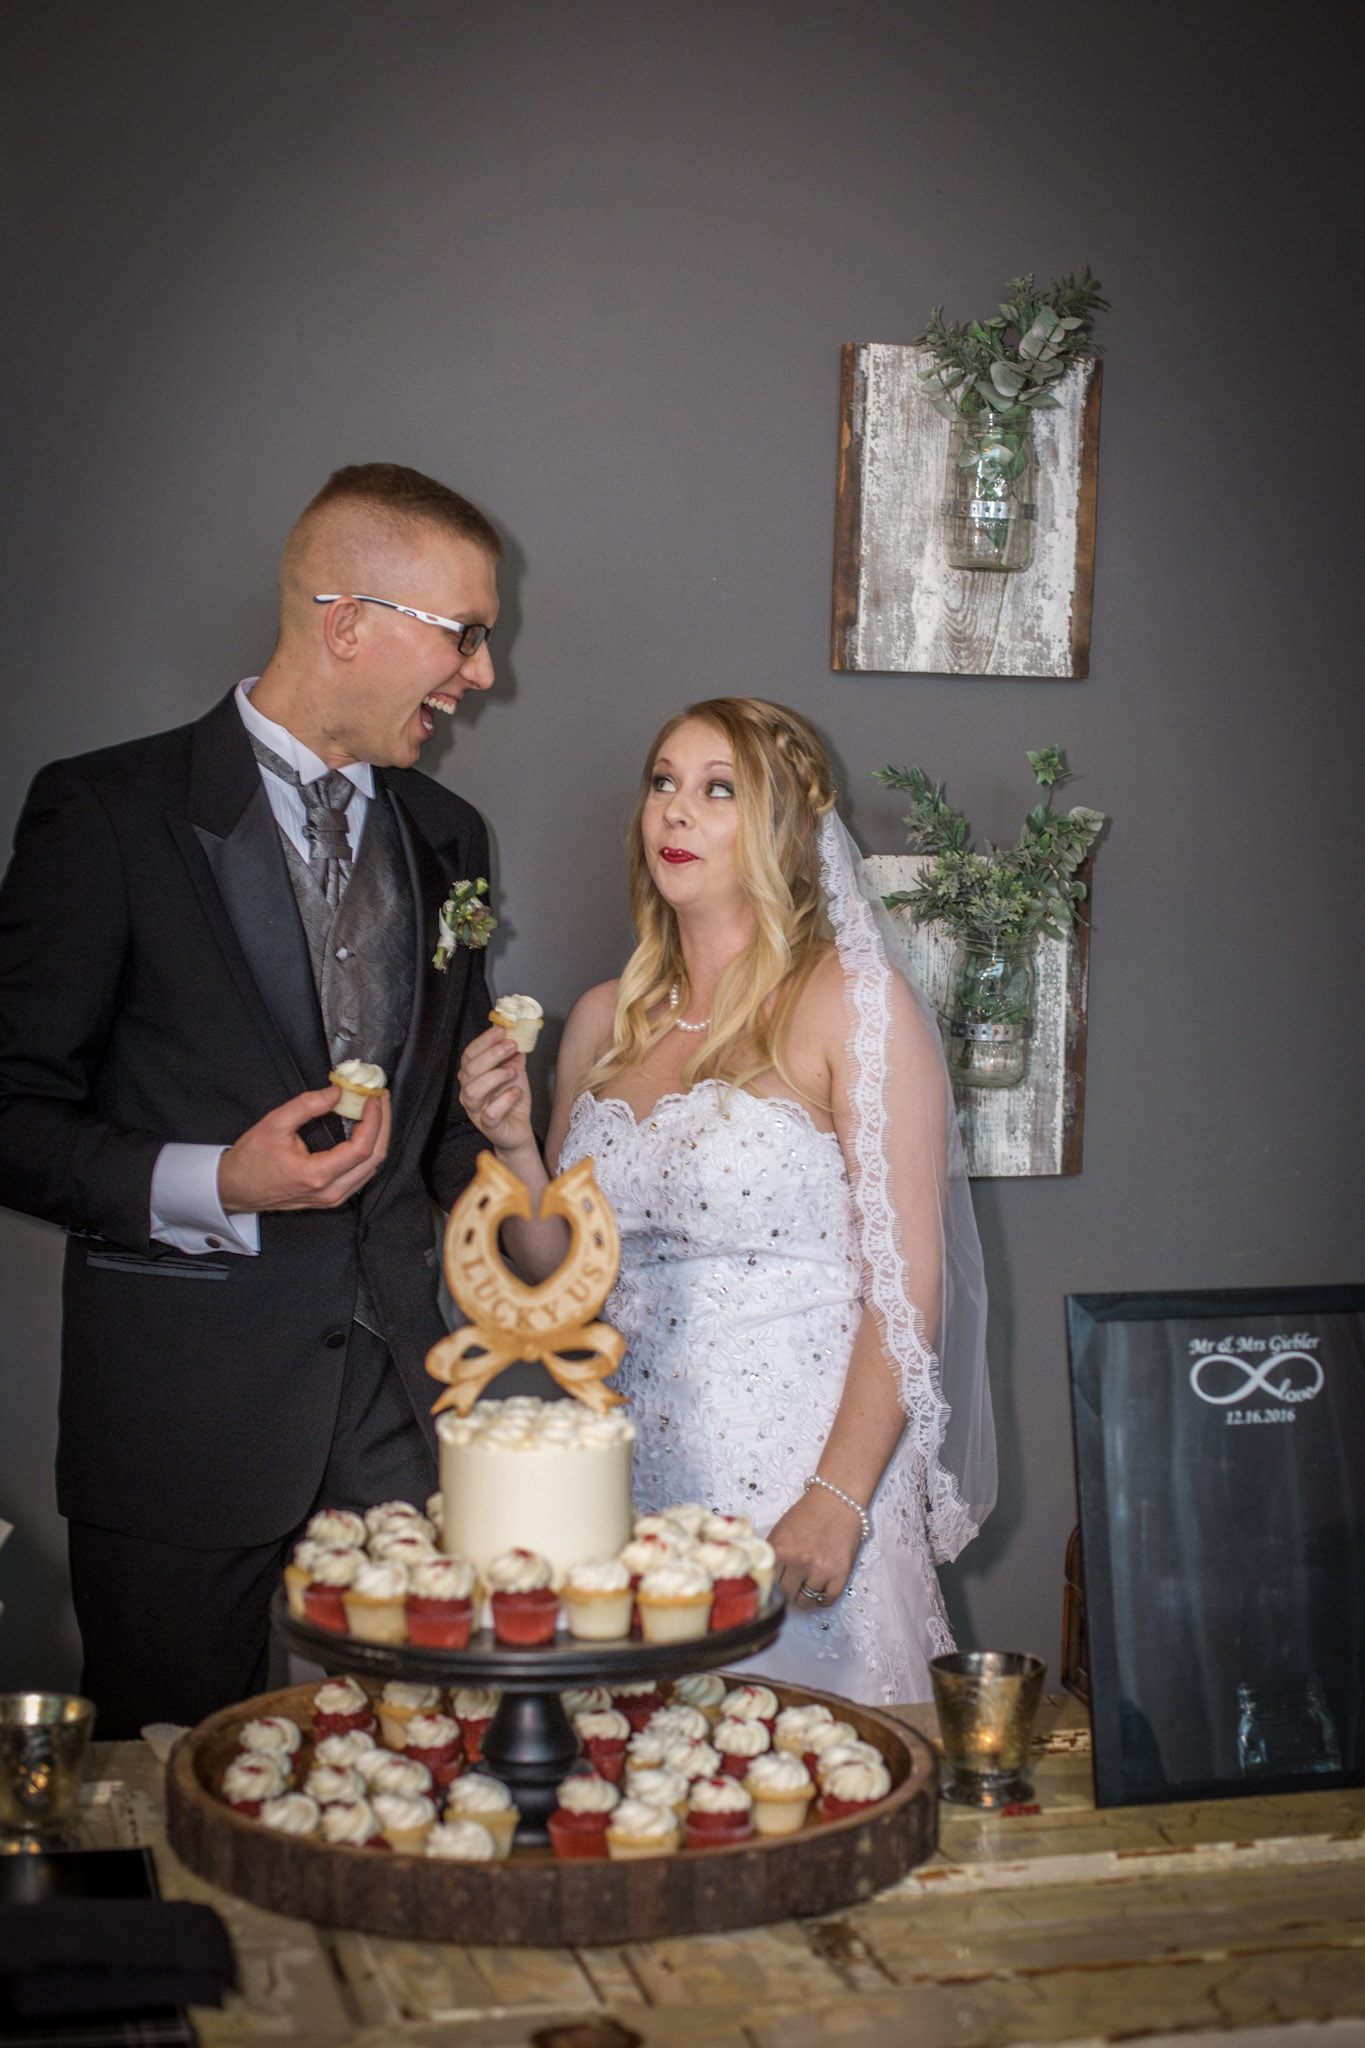 Kansas_City_Small_Intimate_Budget_Wedding_Venue_Maranda&Neal-056.jpg